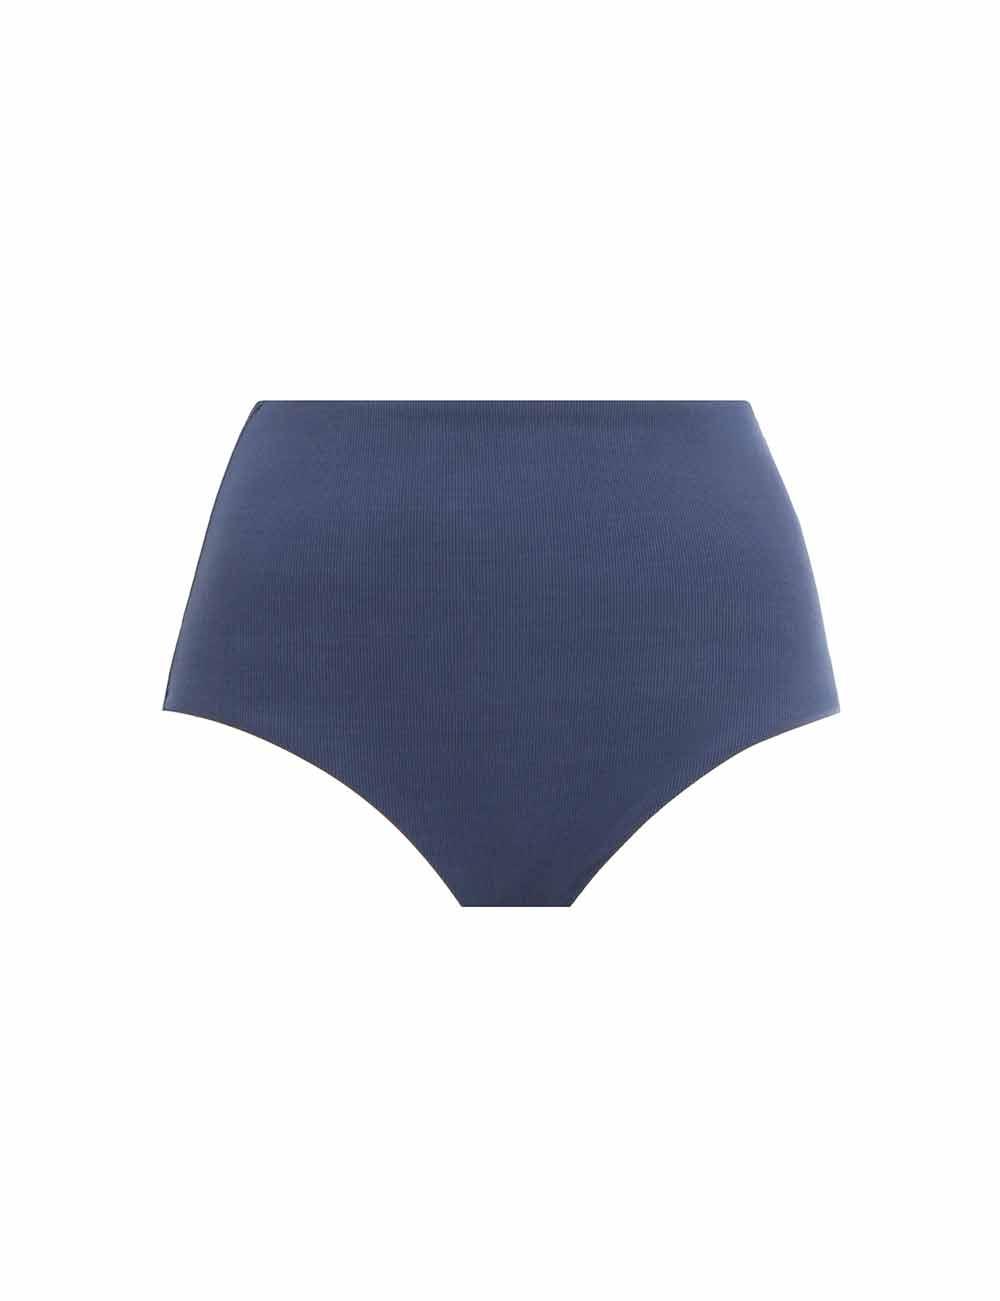 Separates High Waist Pant